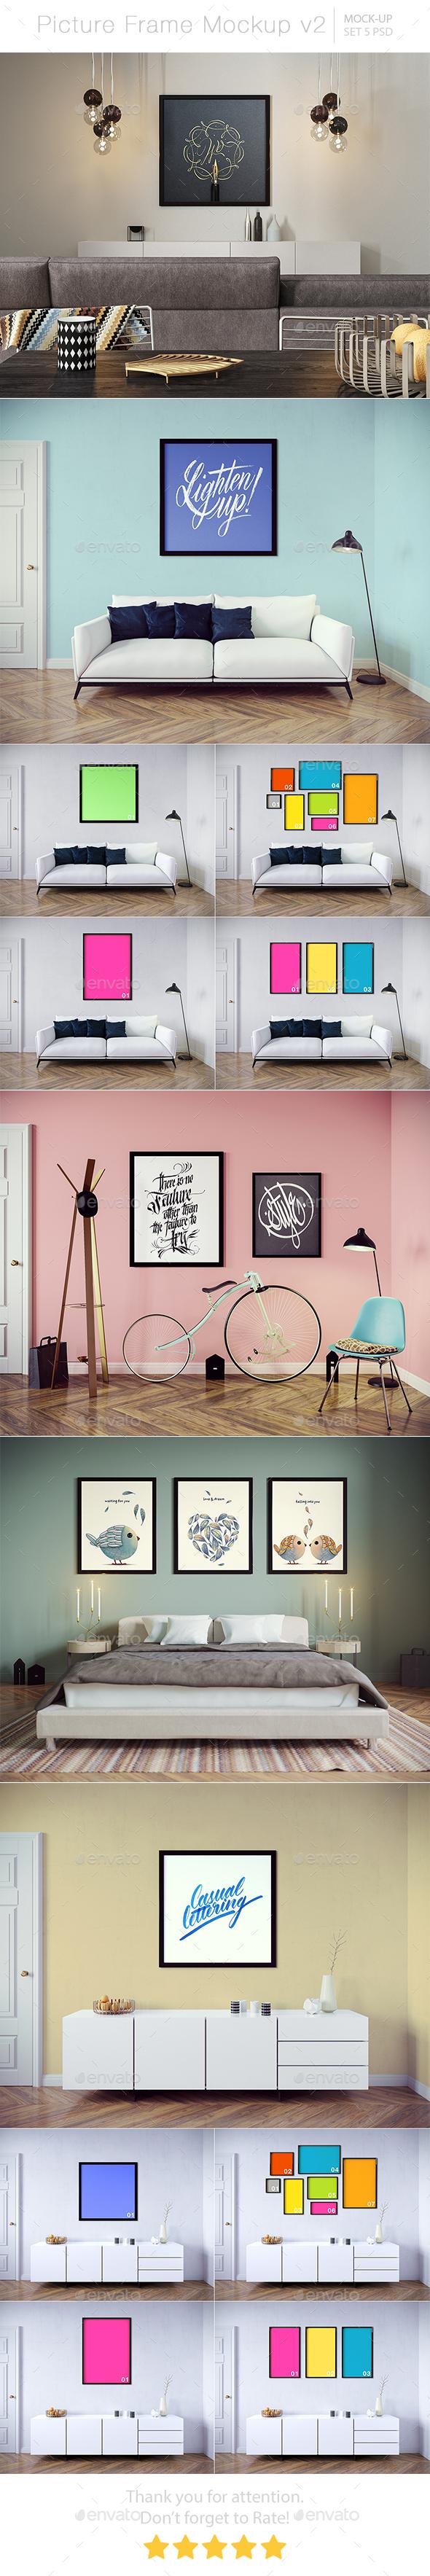 Picture Frame Mockup v2 - Posters Print